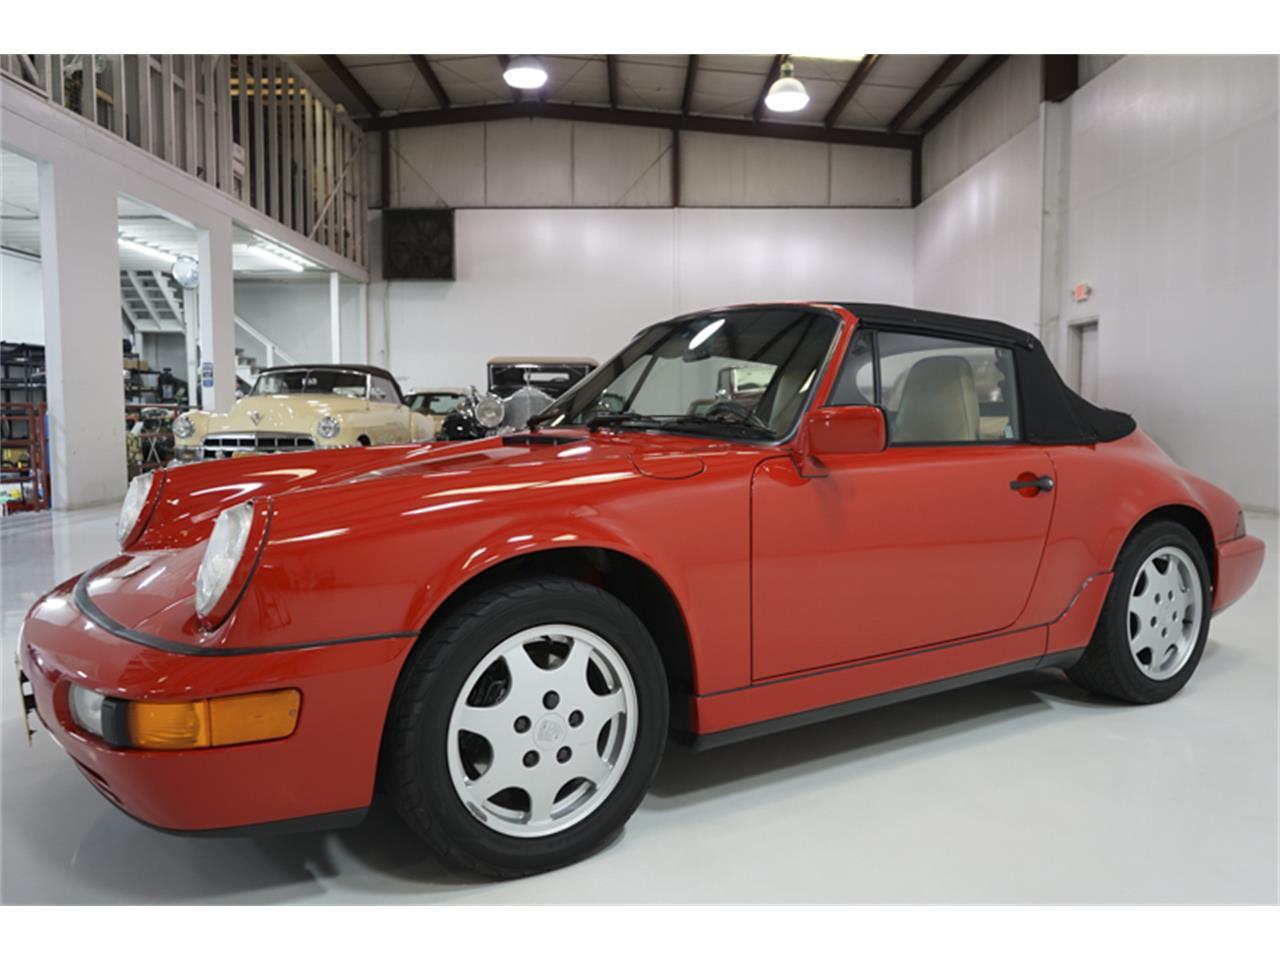 1991 Porsche 911 Carrera 4 Cabriolet (CC-1334635) for sale in Saint Louis, Missouri